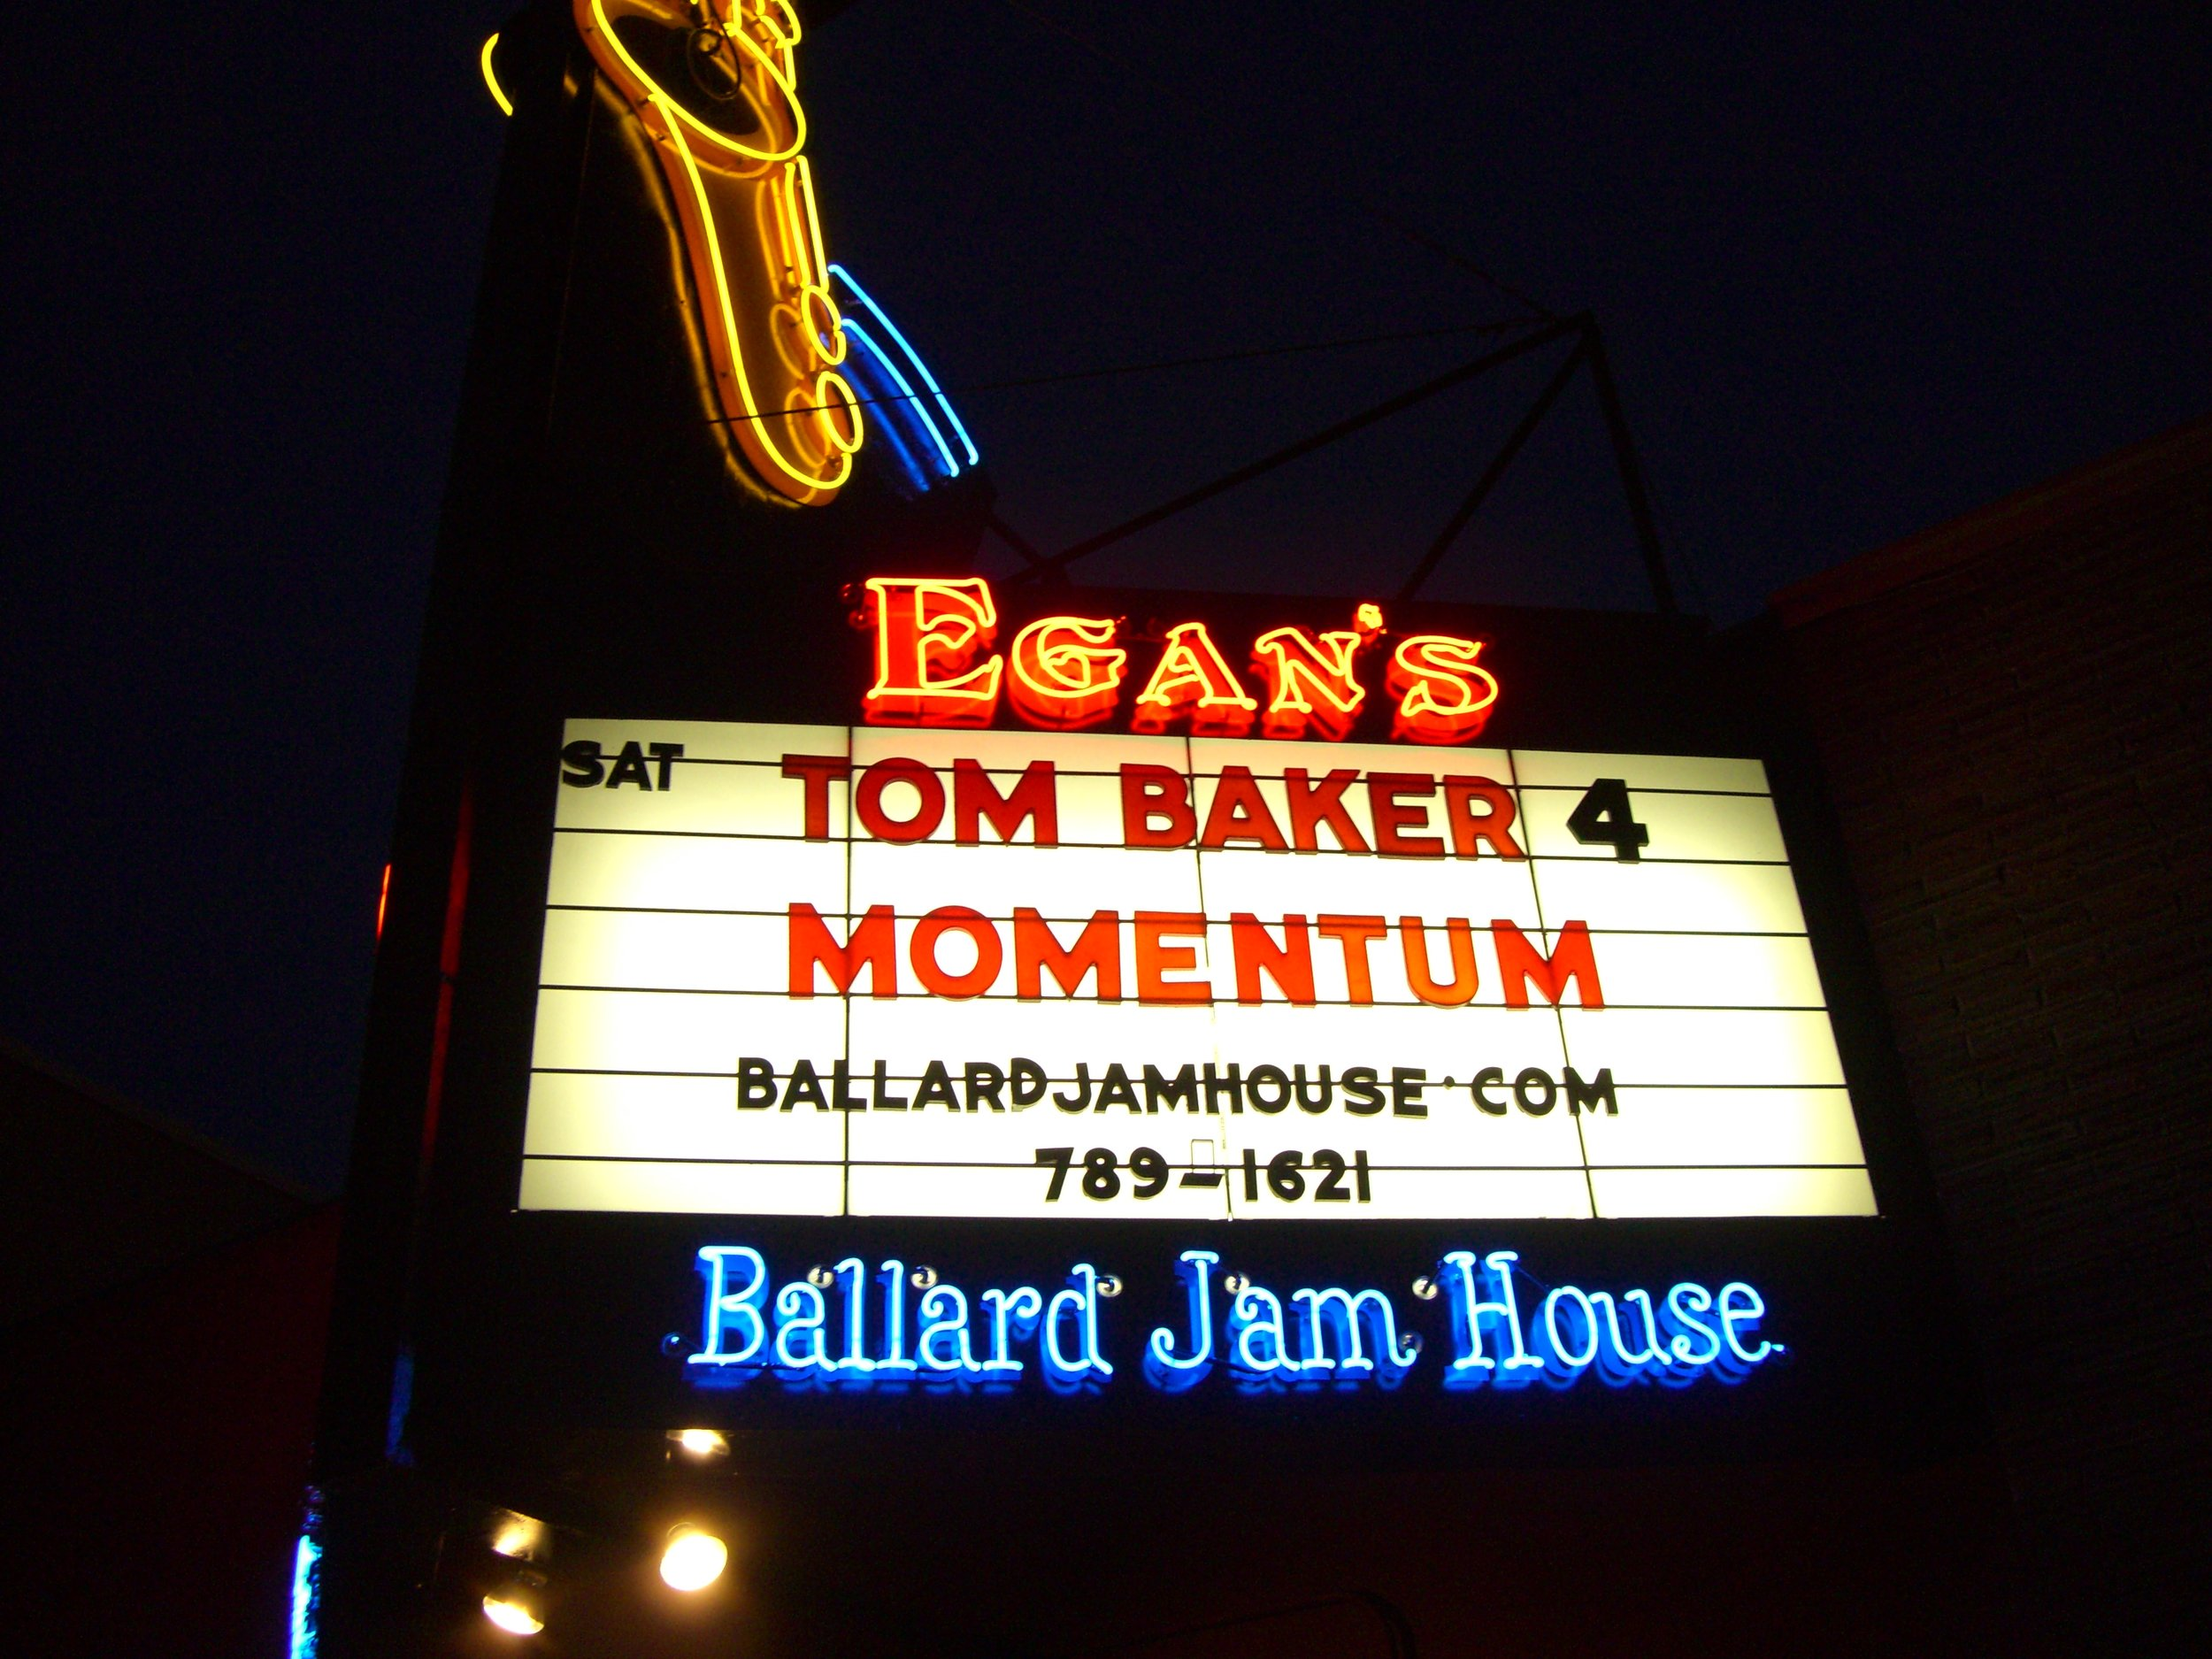 Tom Baker Quartet at Egan's